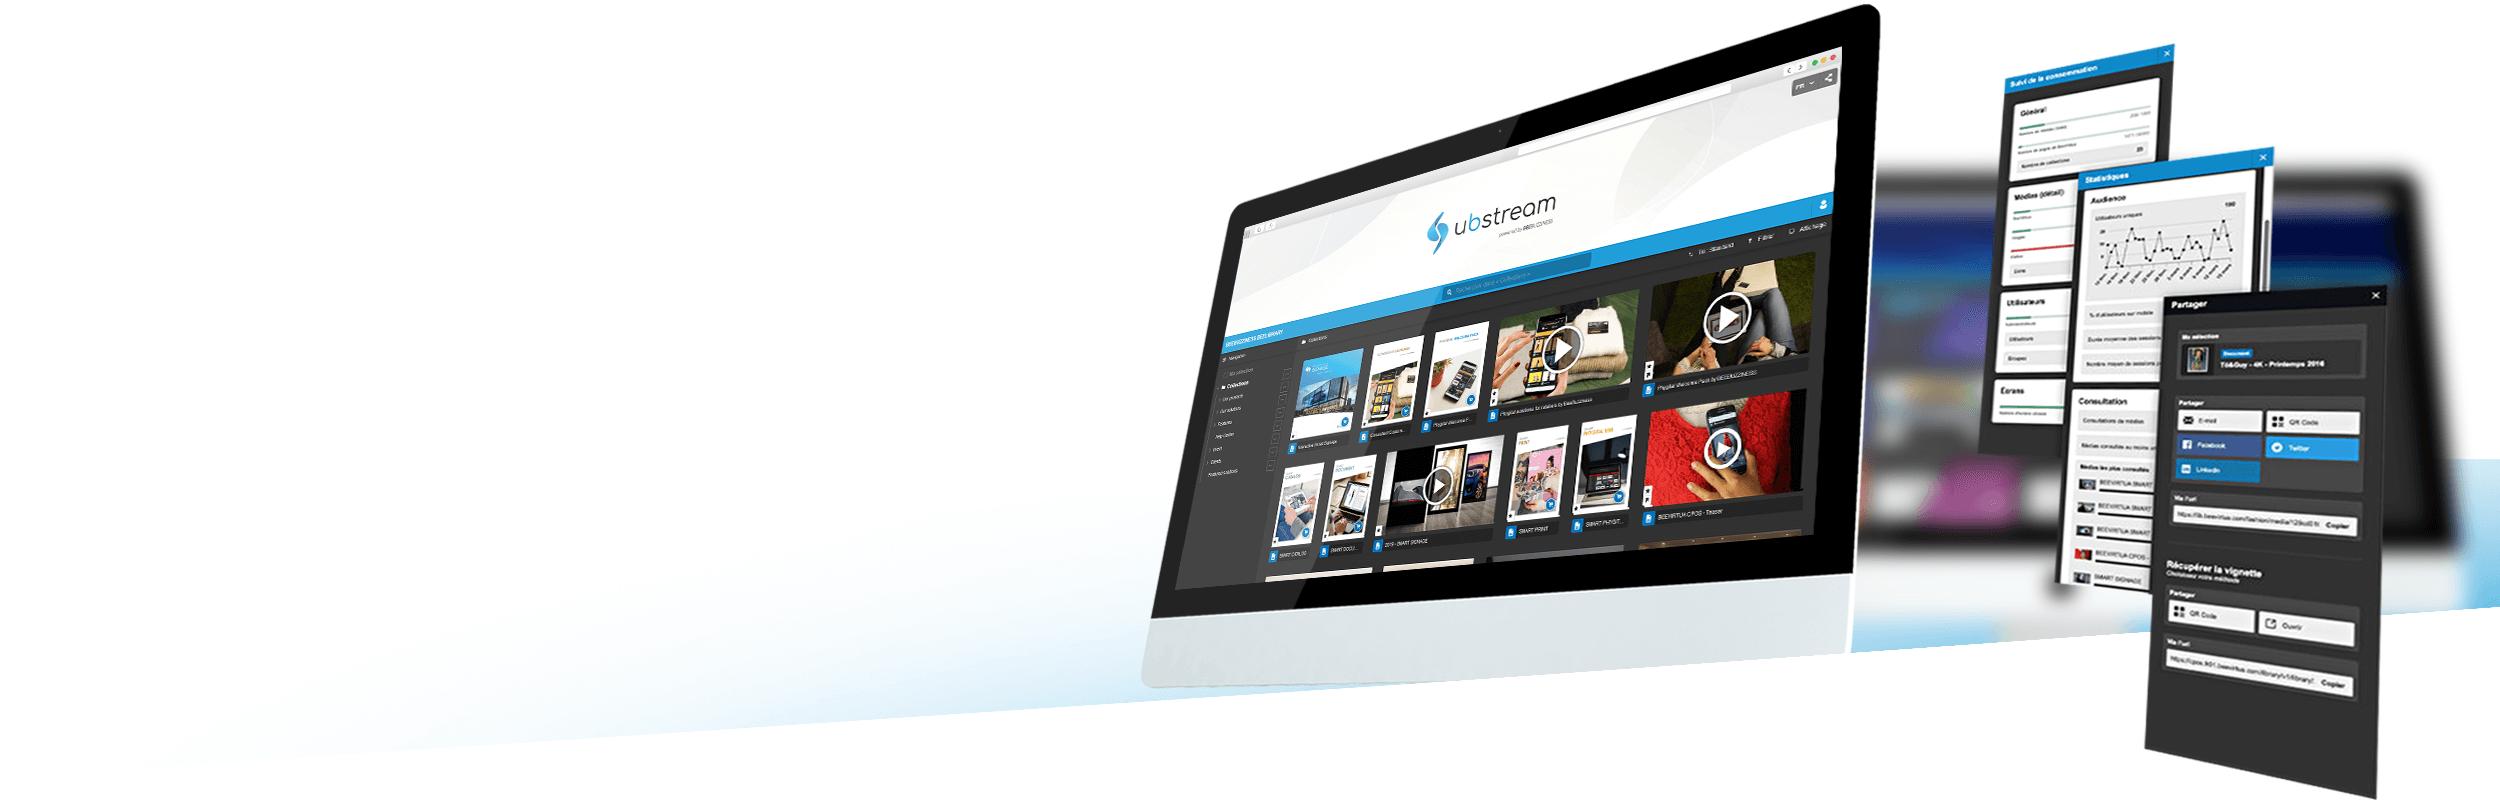 Smart Hub - Le premier hub nativement omnicanal & phygital